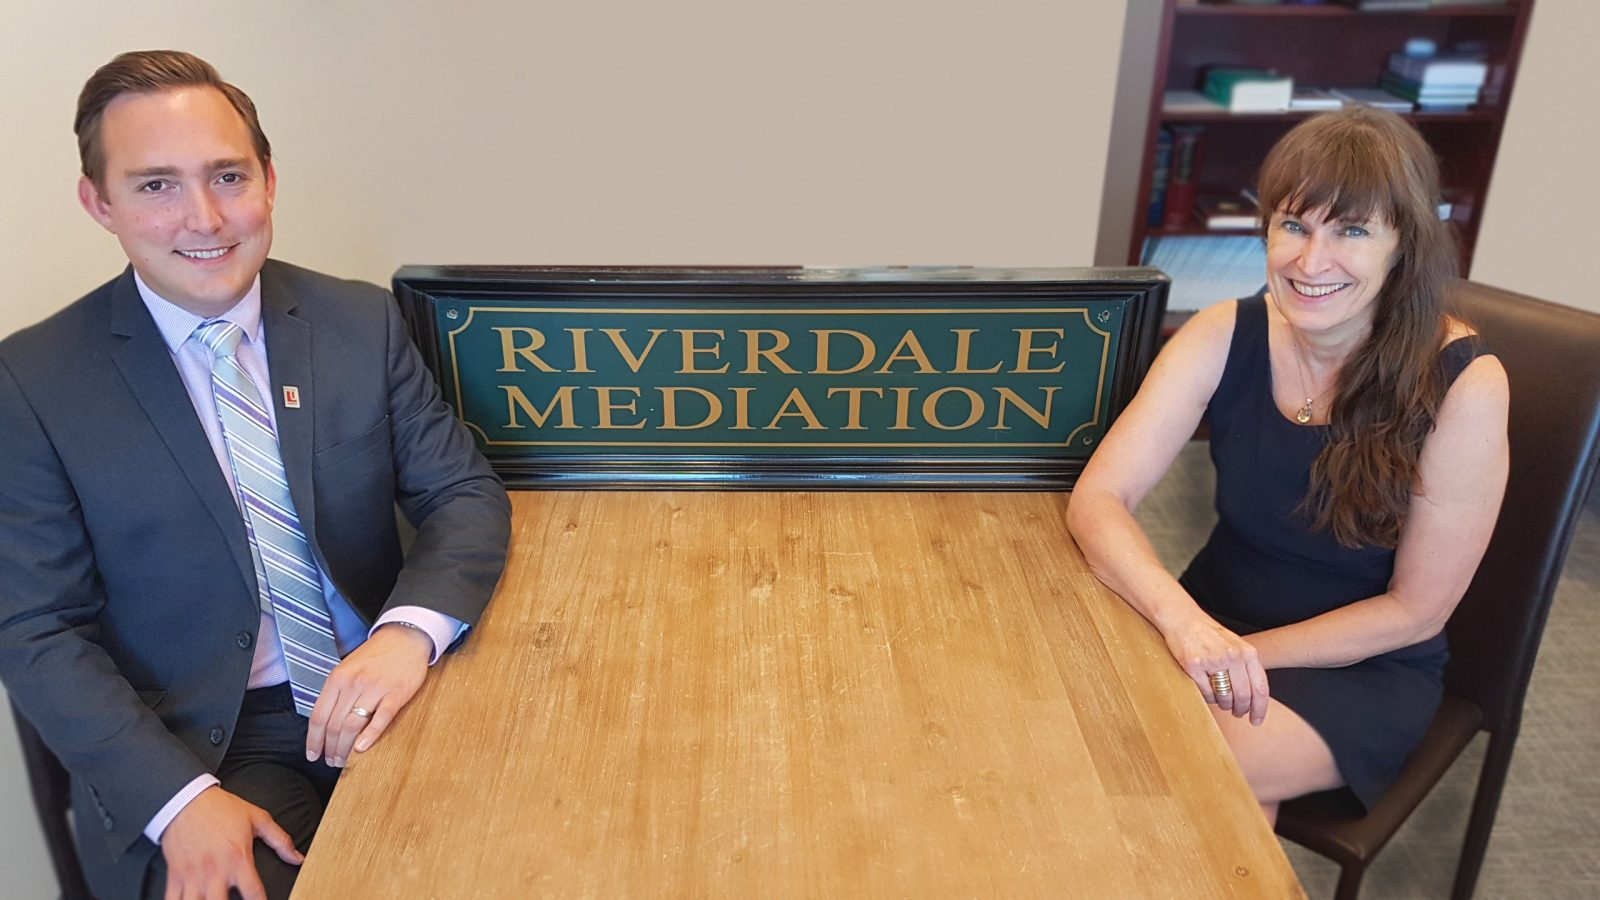 Family Mediation Program Manager Sean Woodhead and Riiverdale Mediation President Hilary Linton